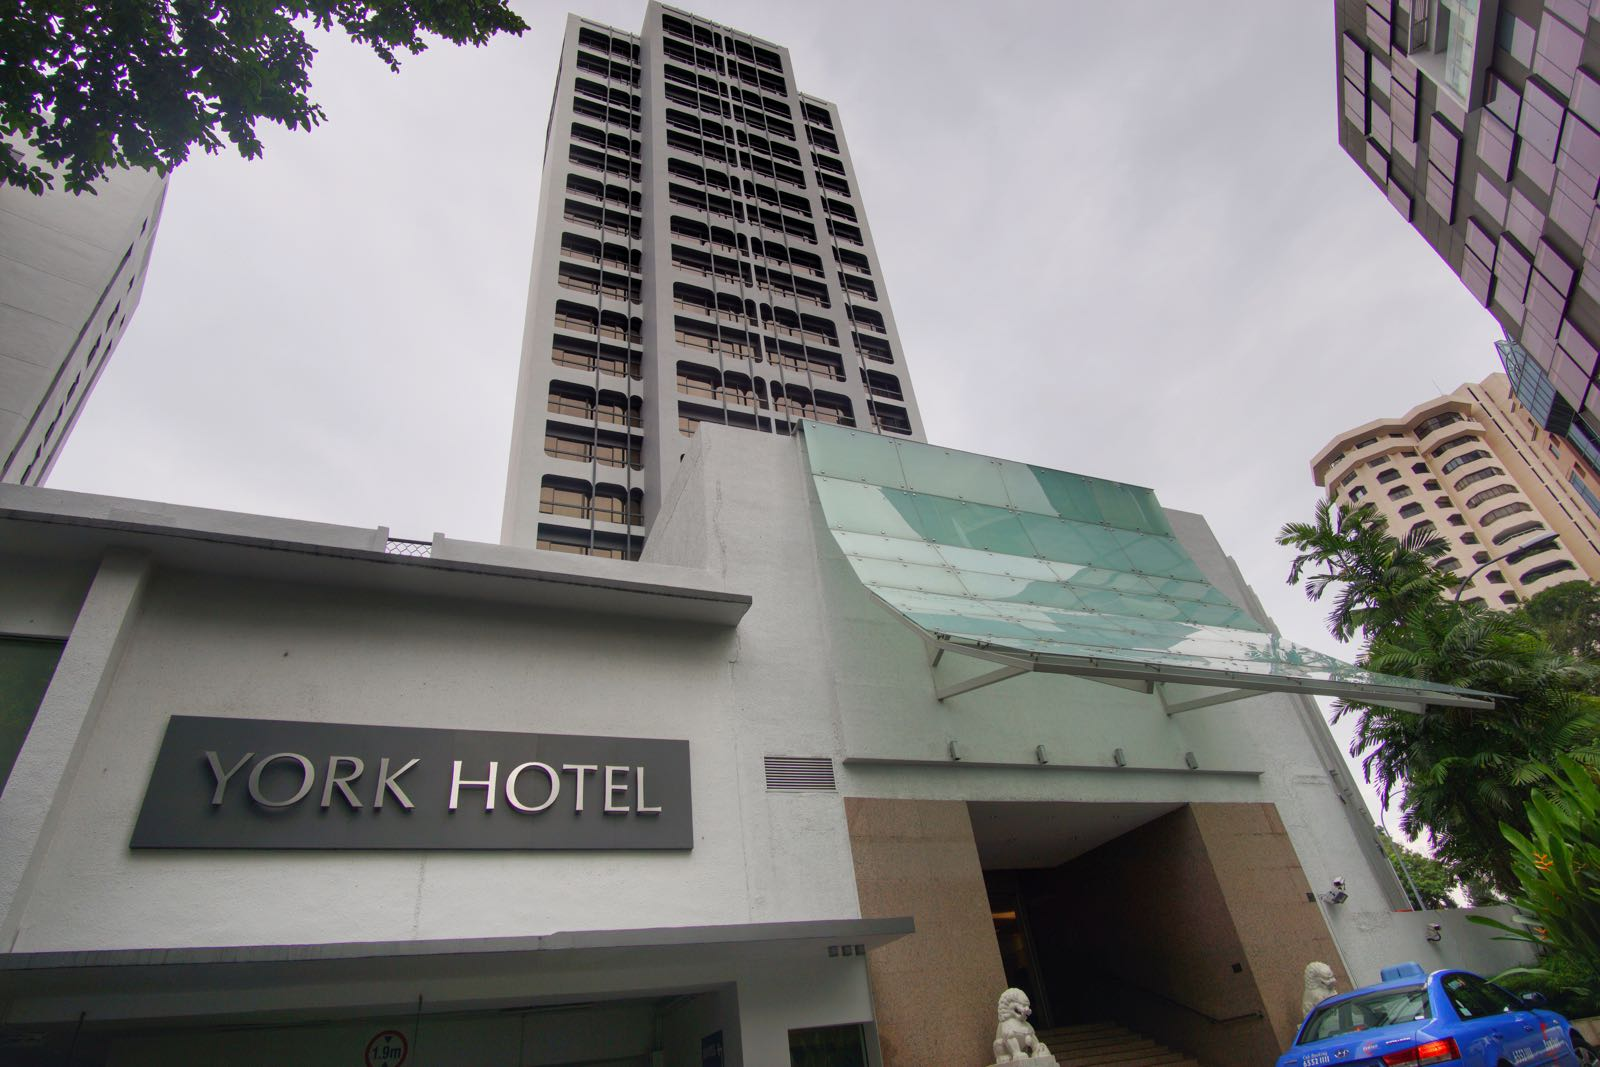 York Hotel Orchard Singapore Lokasinya Sangat Strategis